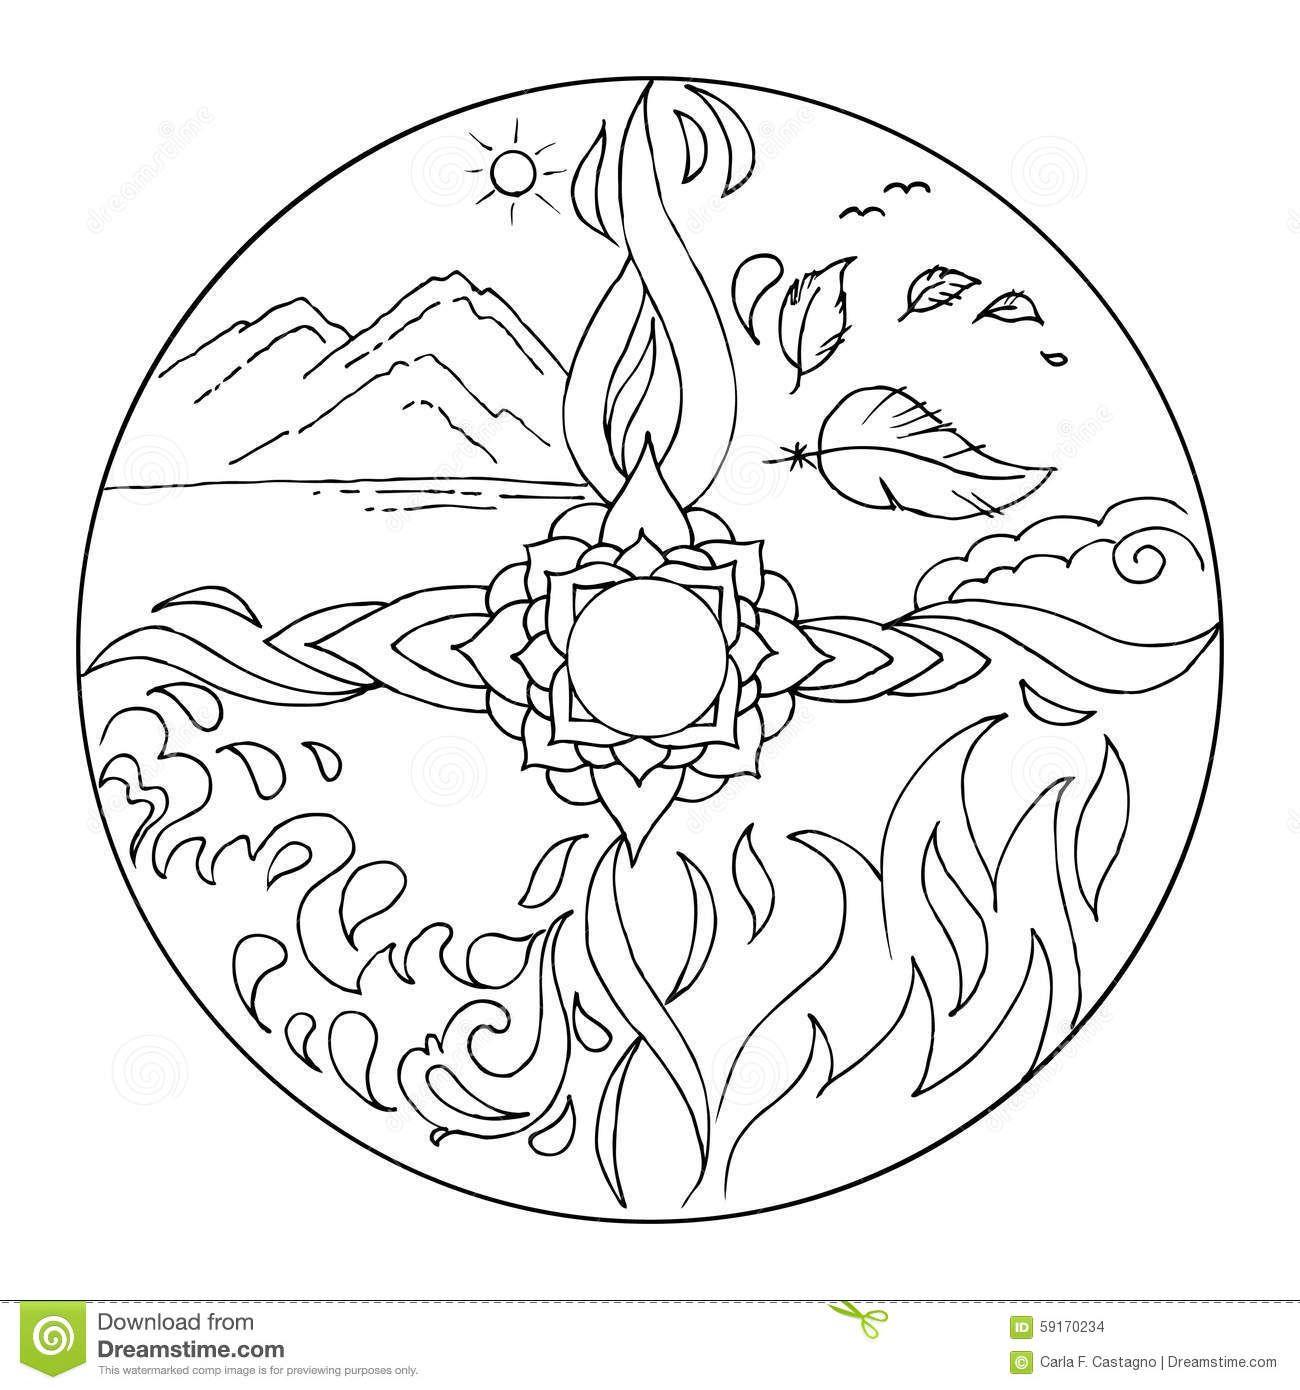 Coloring 4 Elements Mandala Diksha - Download From Over 41